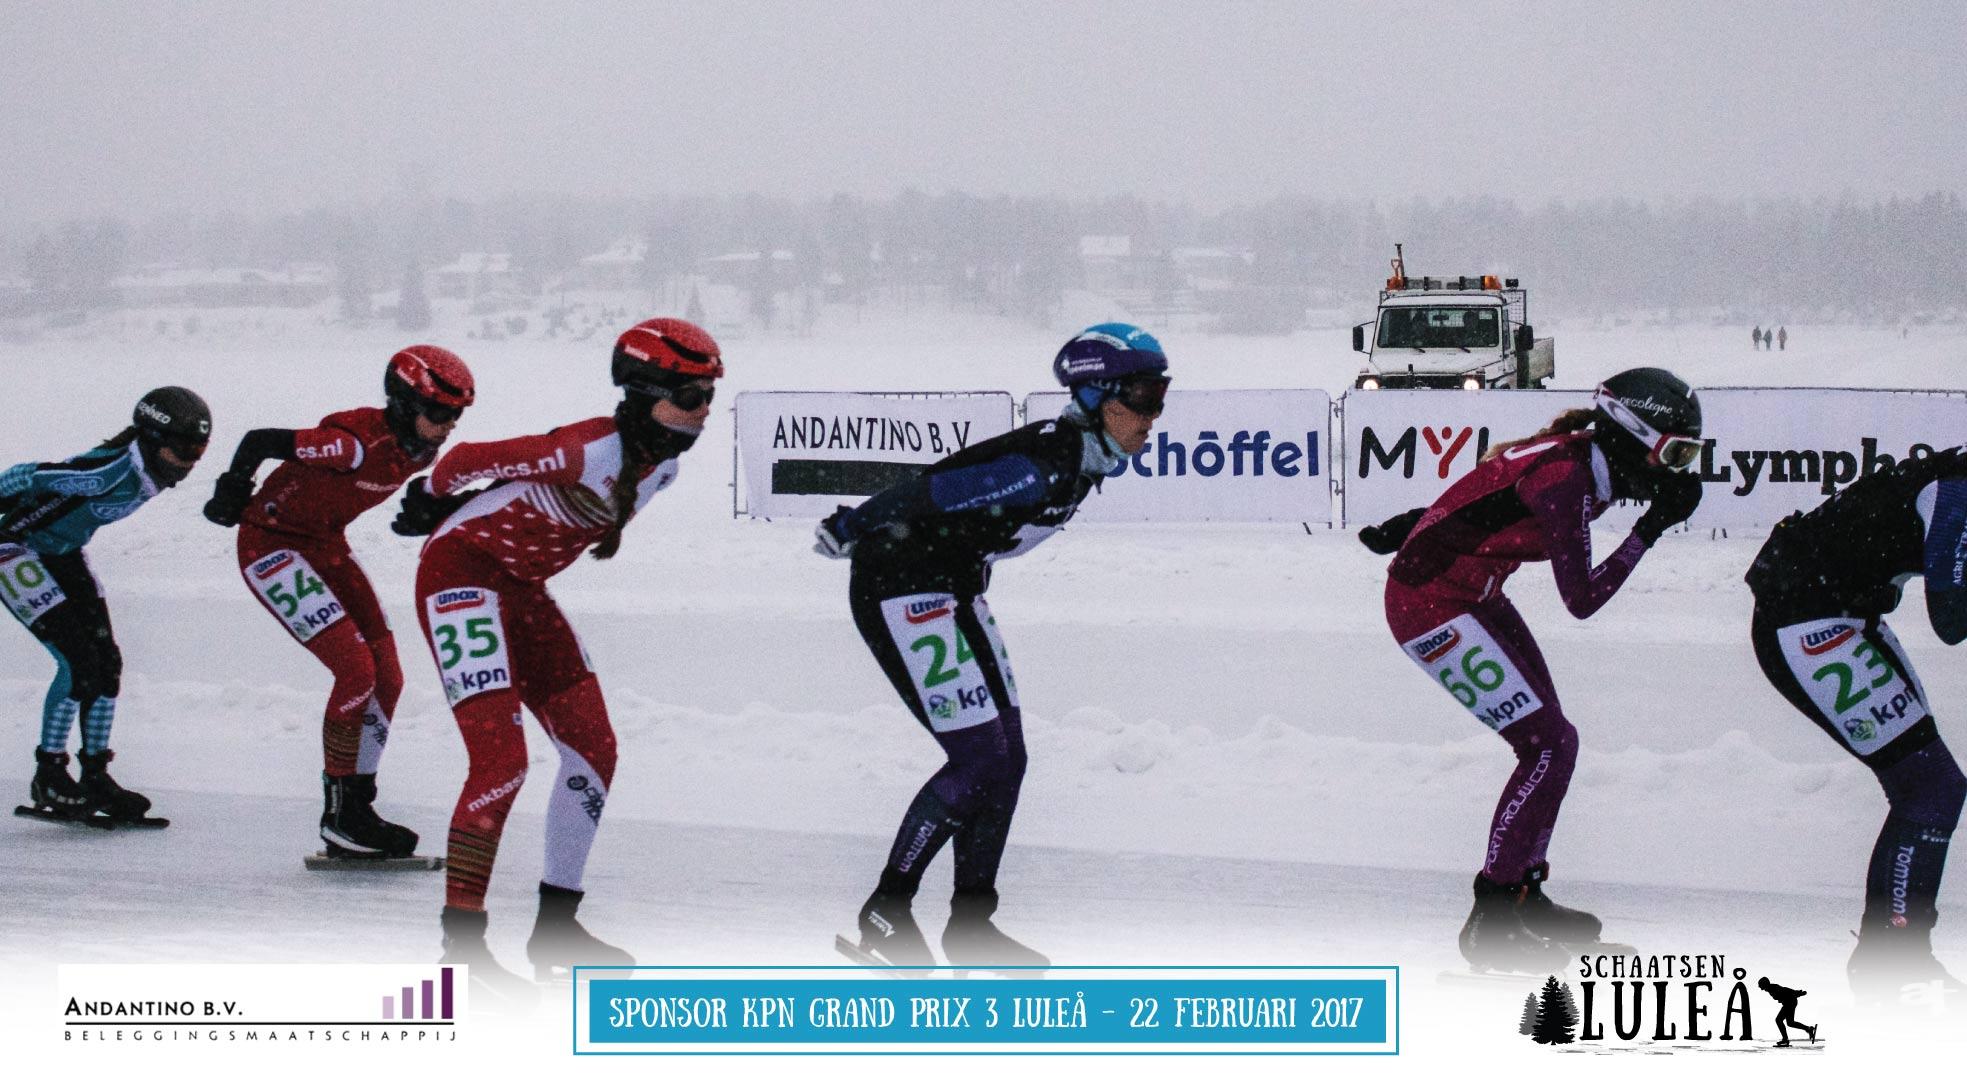 andantino-lulea-zweeds-lapland-kpn-grand-prix